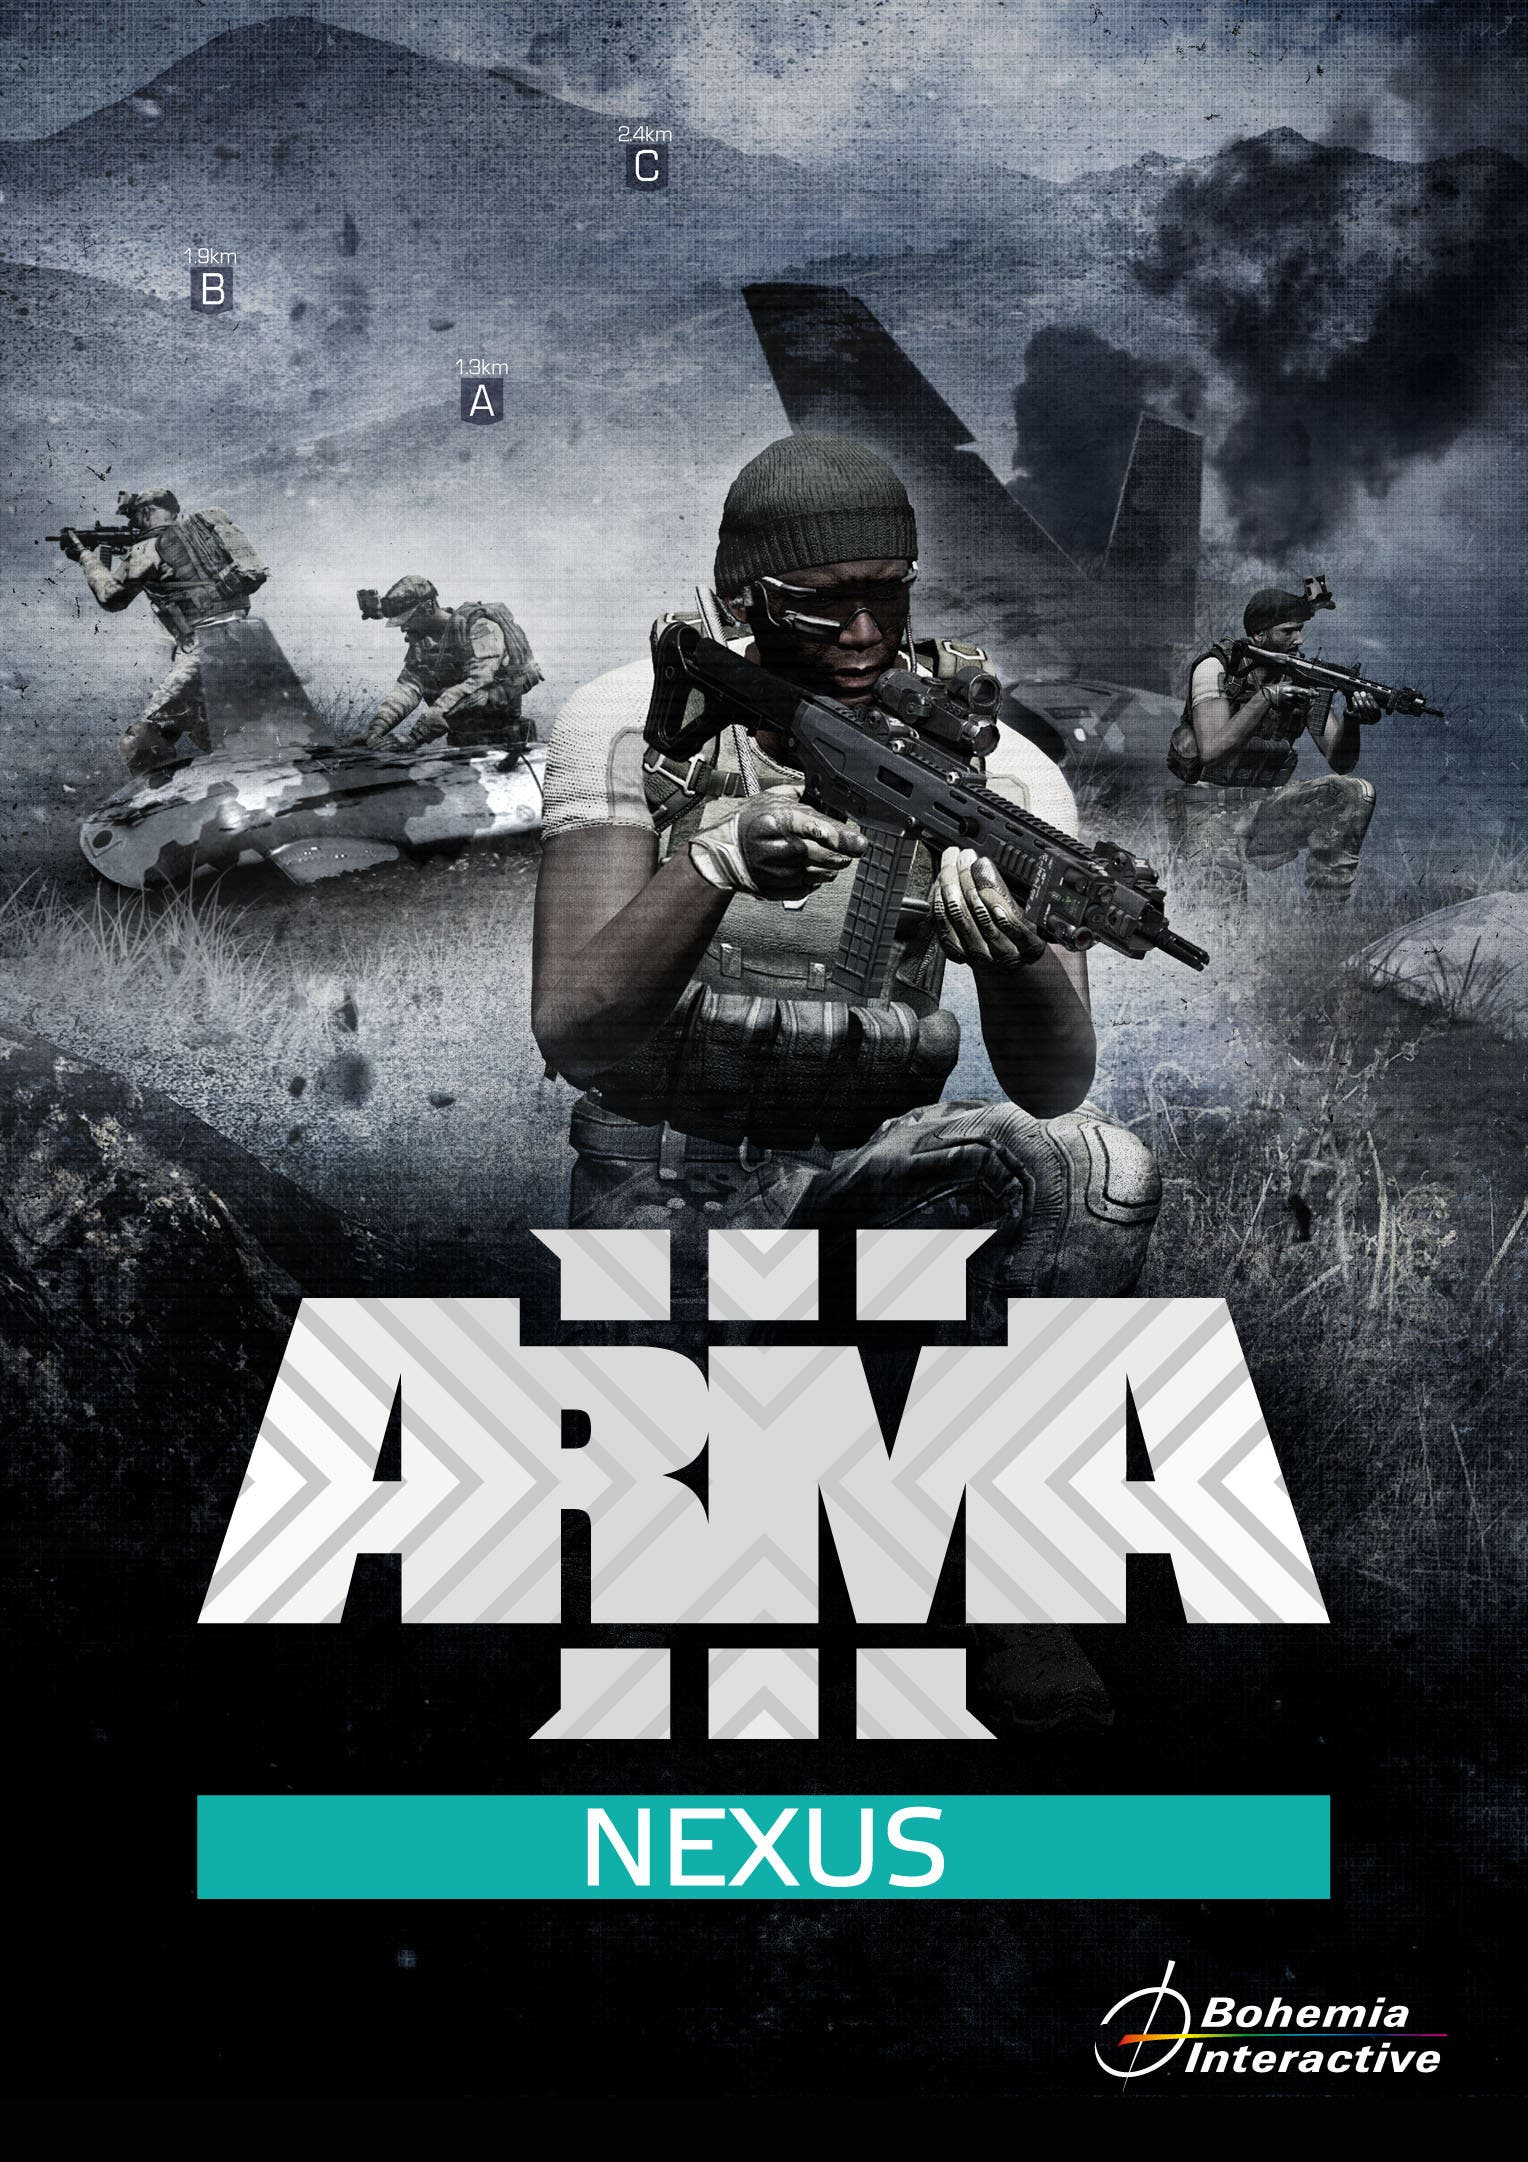 arma3_nexusupdate_artwork